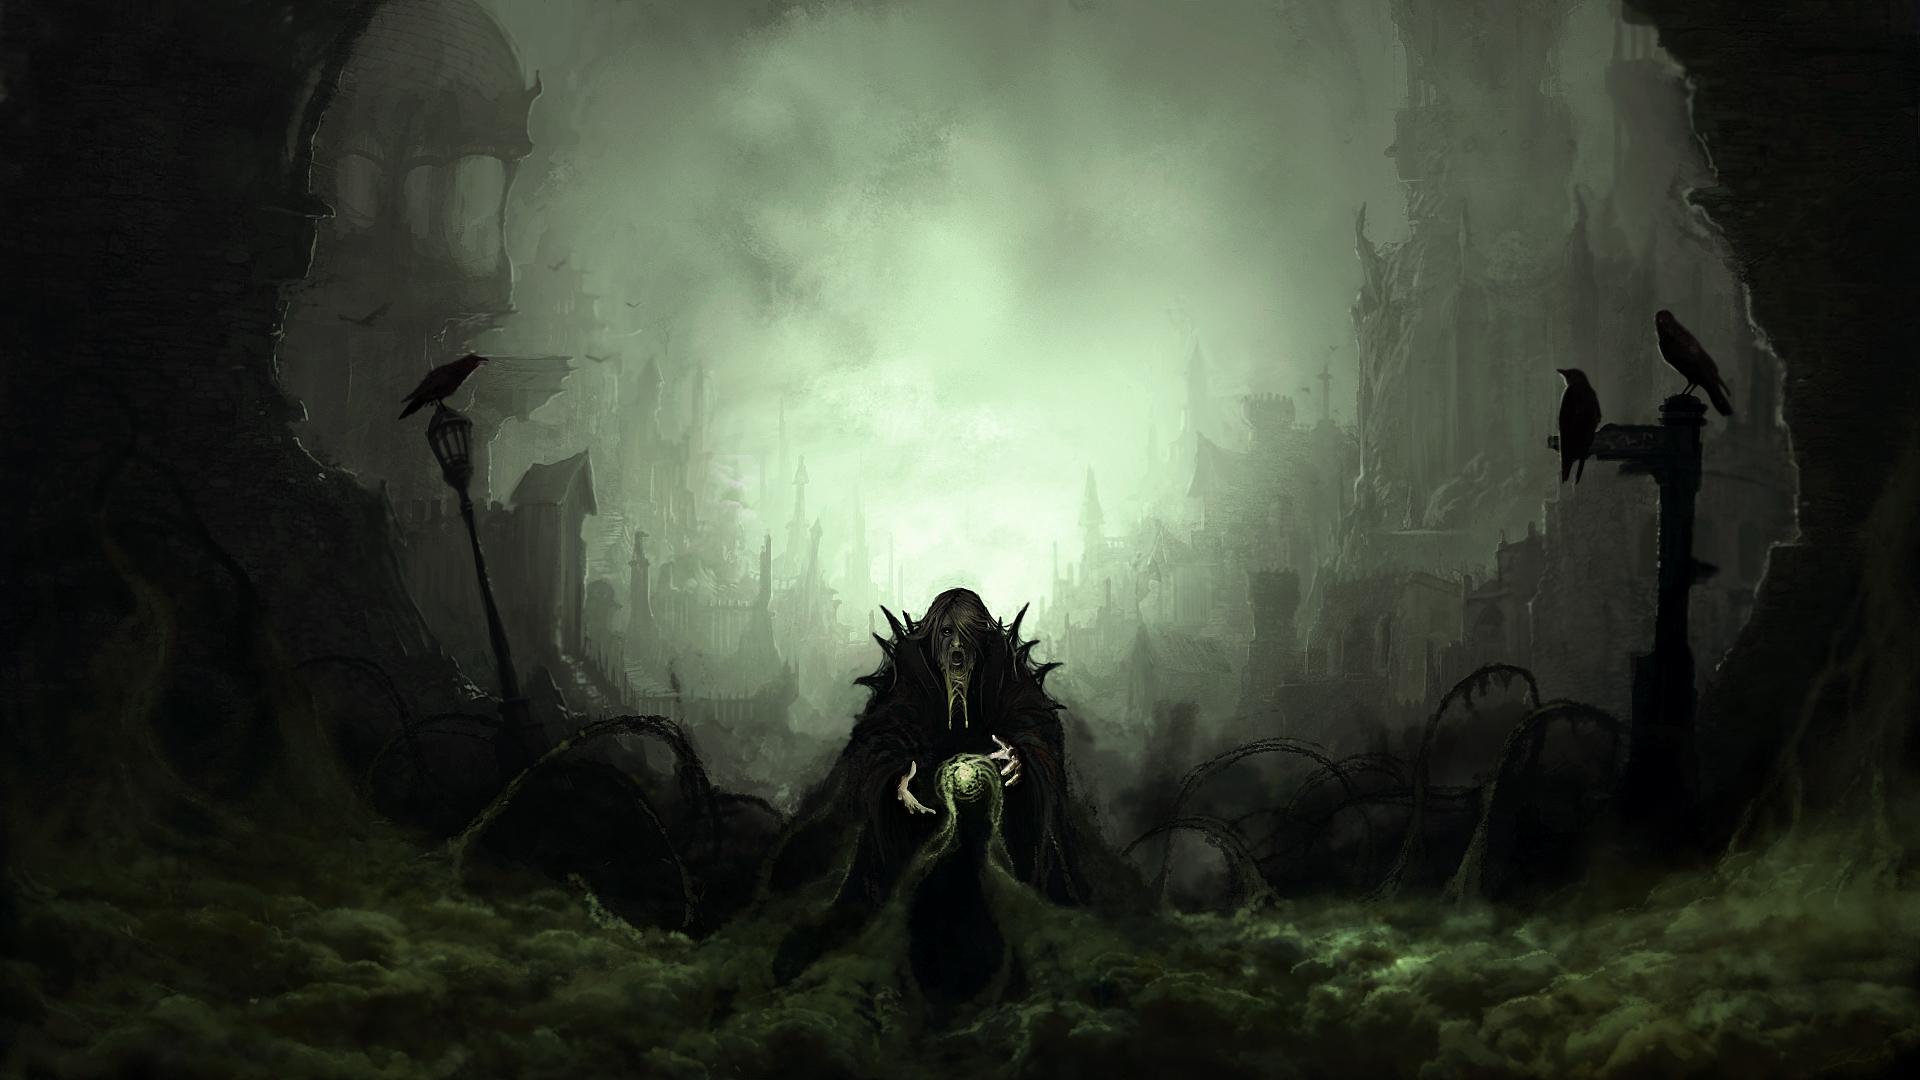 dark art |     Madoushi anime dark horror fantasy magic evil art